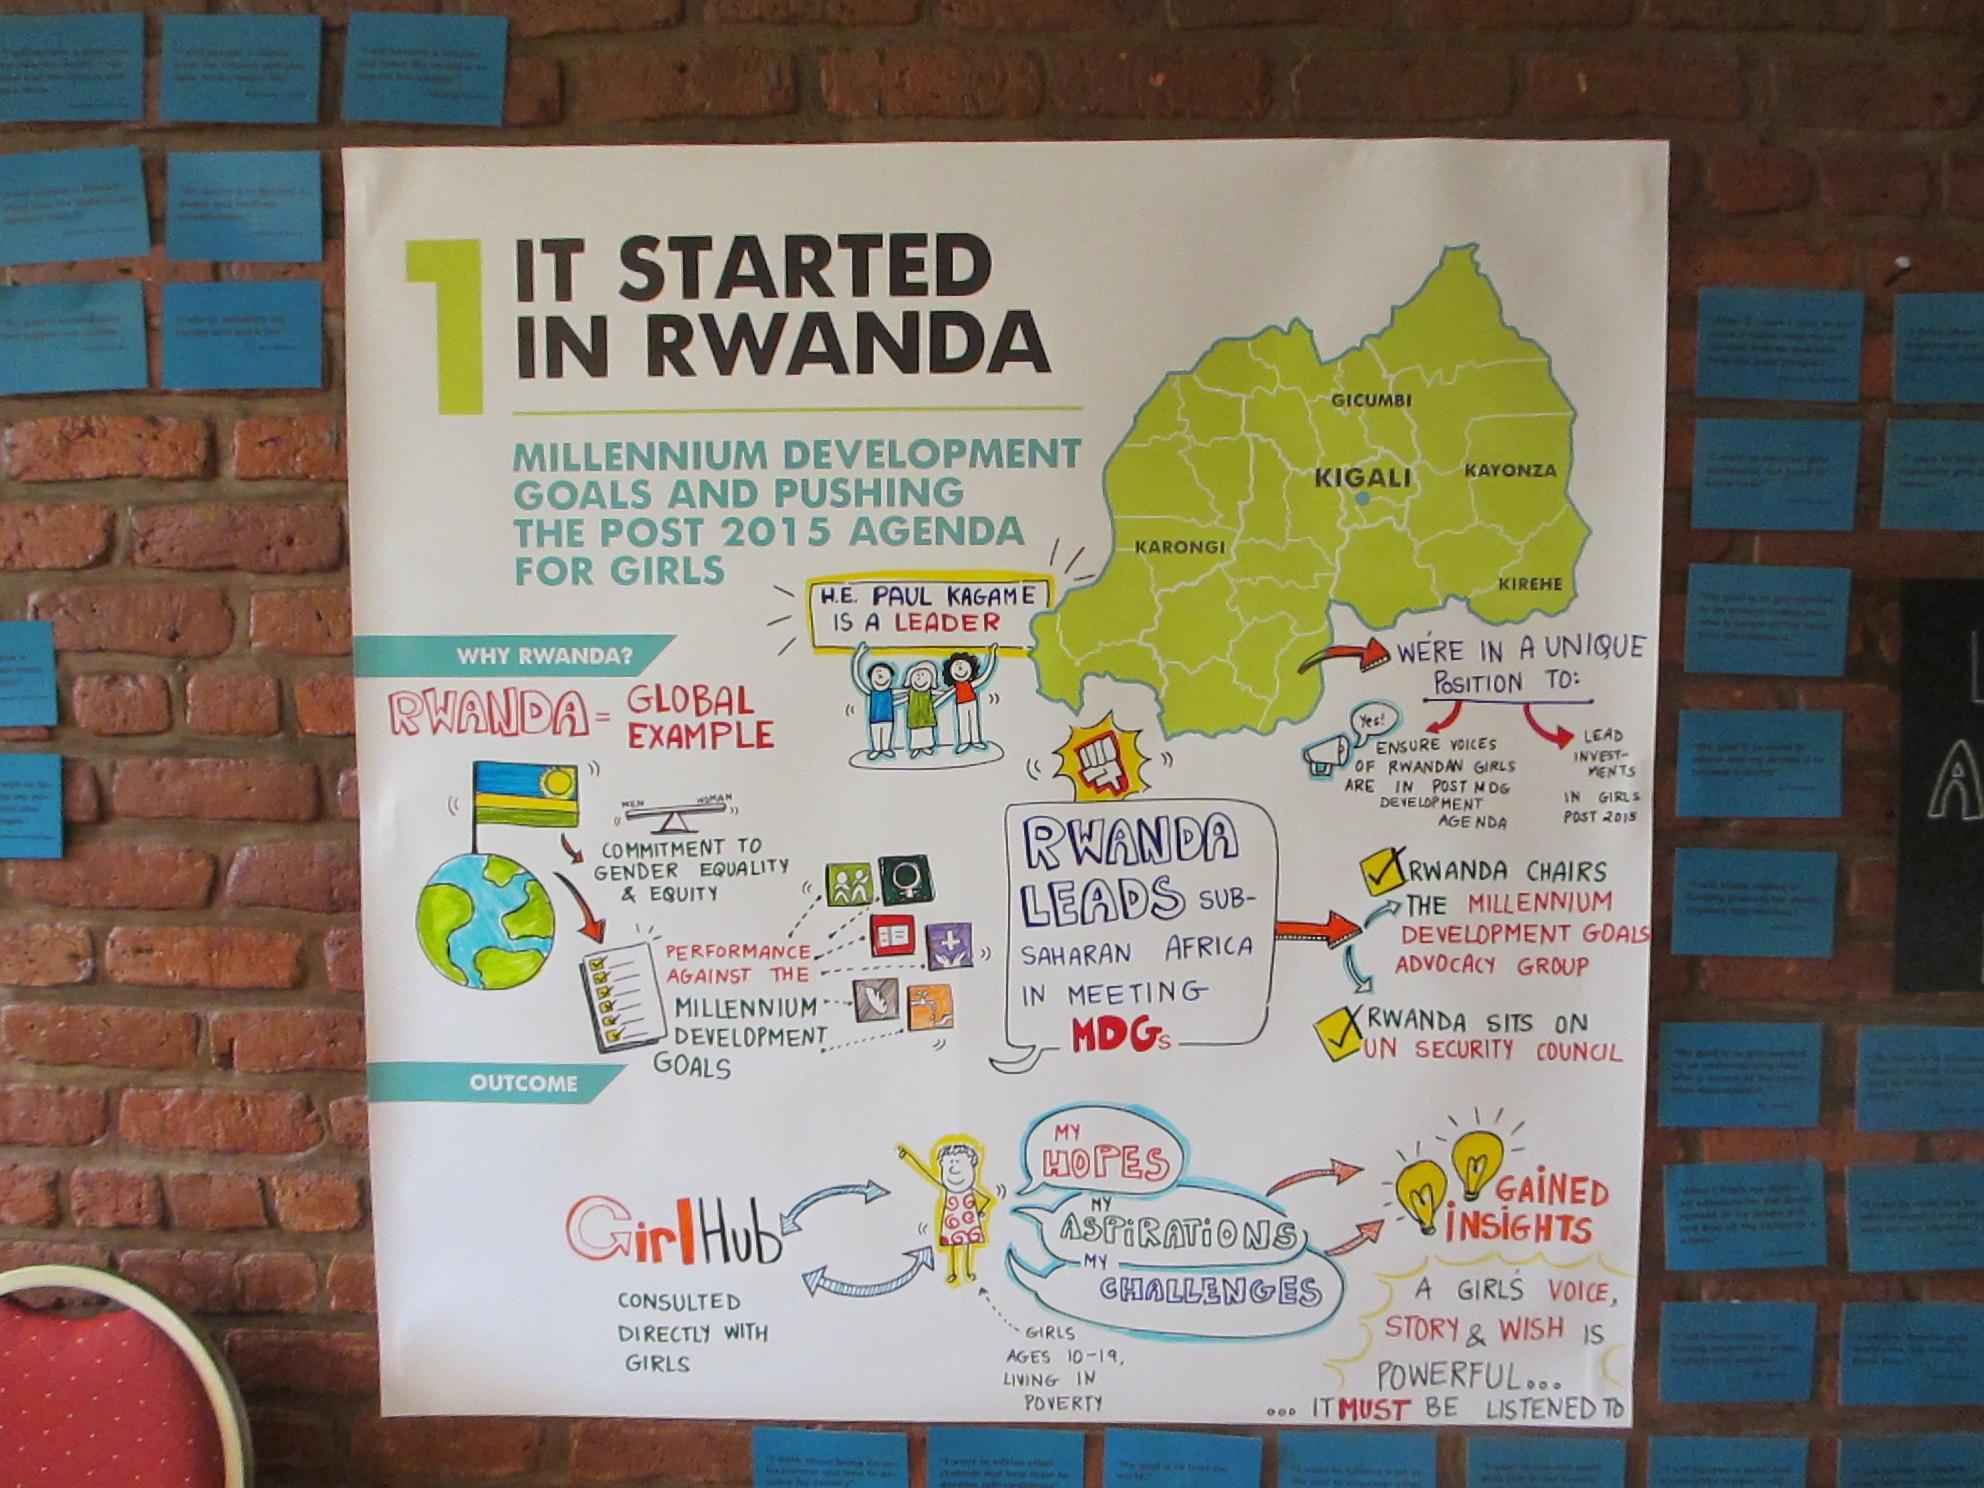 The Girl agenda started in Rwanda.jpg